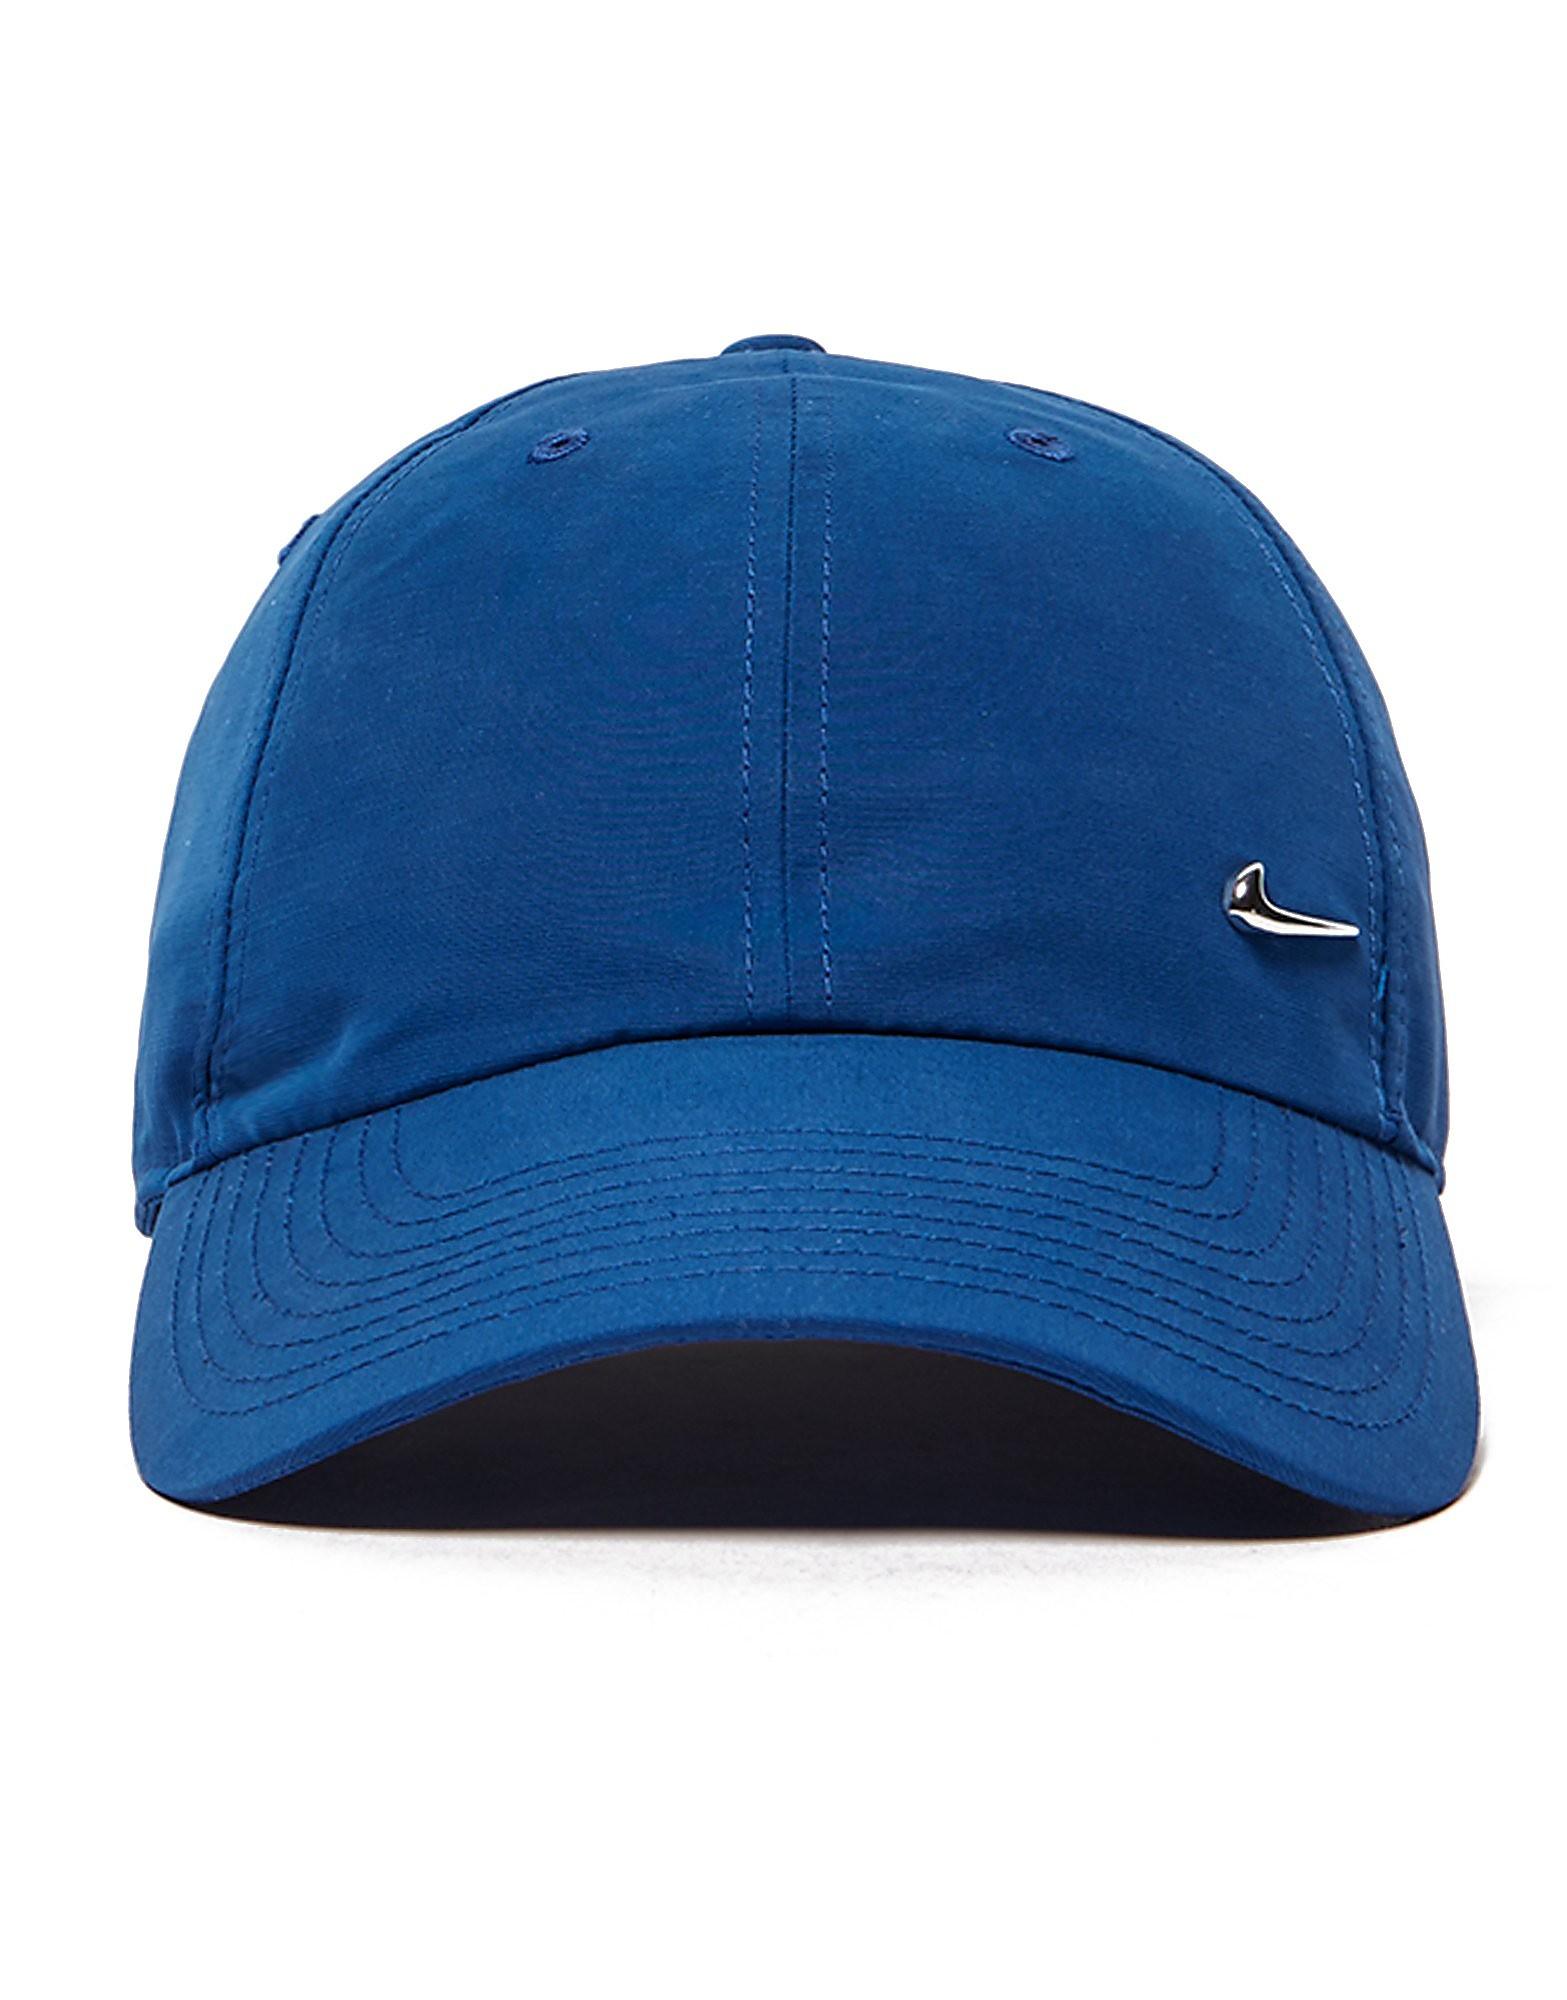 Nike Casquette Side Swoosh Homme